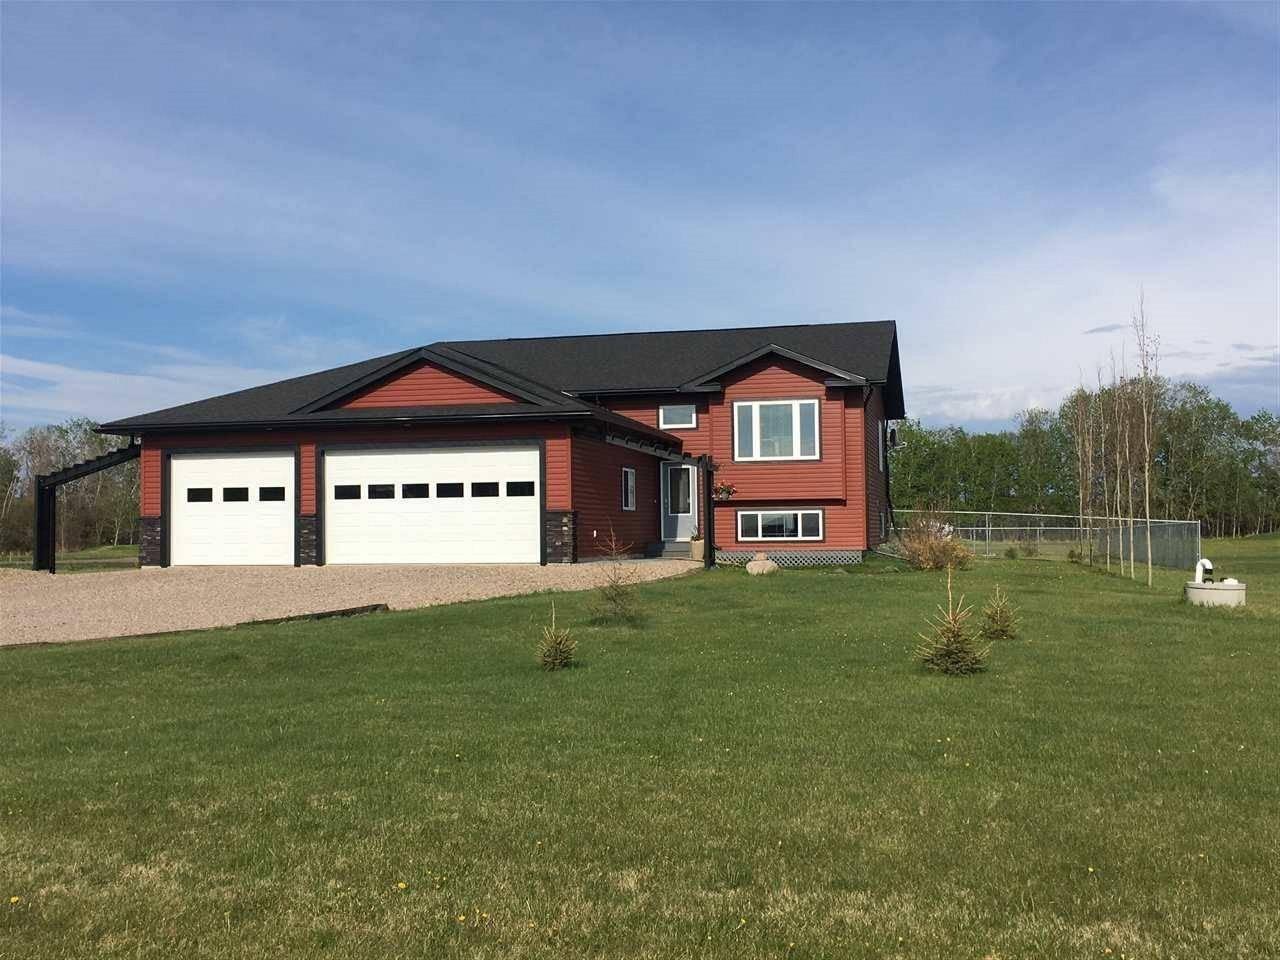 House for sale at 42230 632 Rd Rural Bonnyville M.d. Alberta - MLS: E4157395